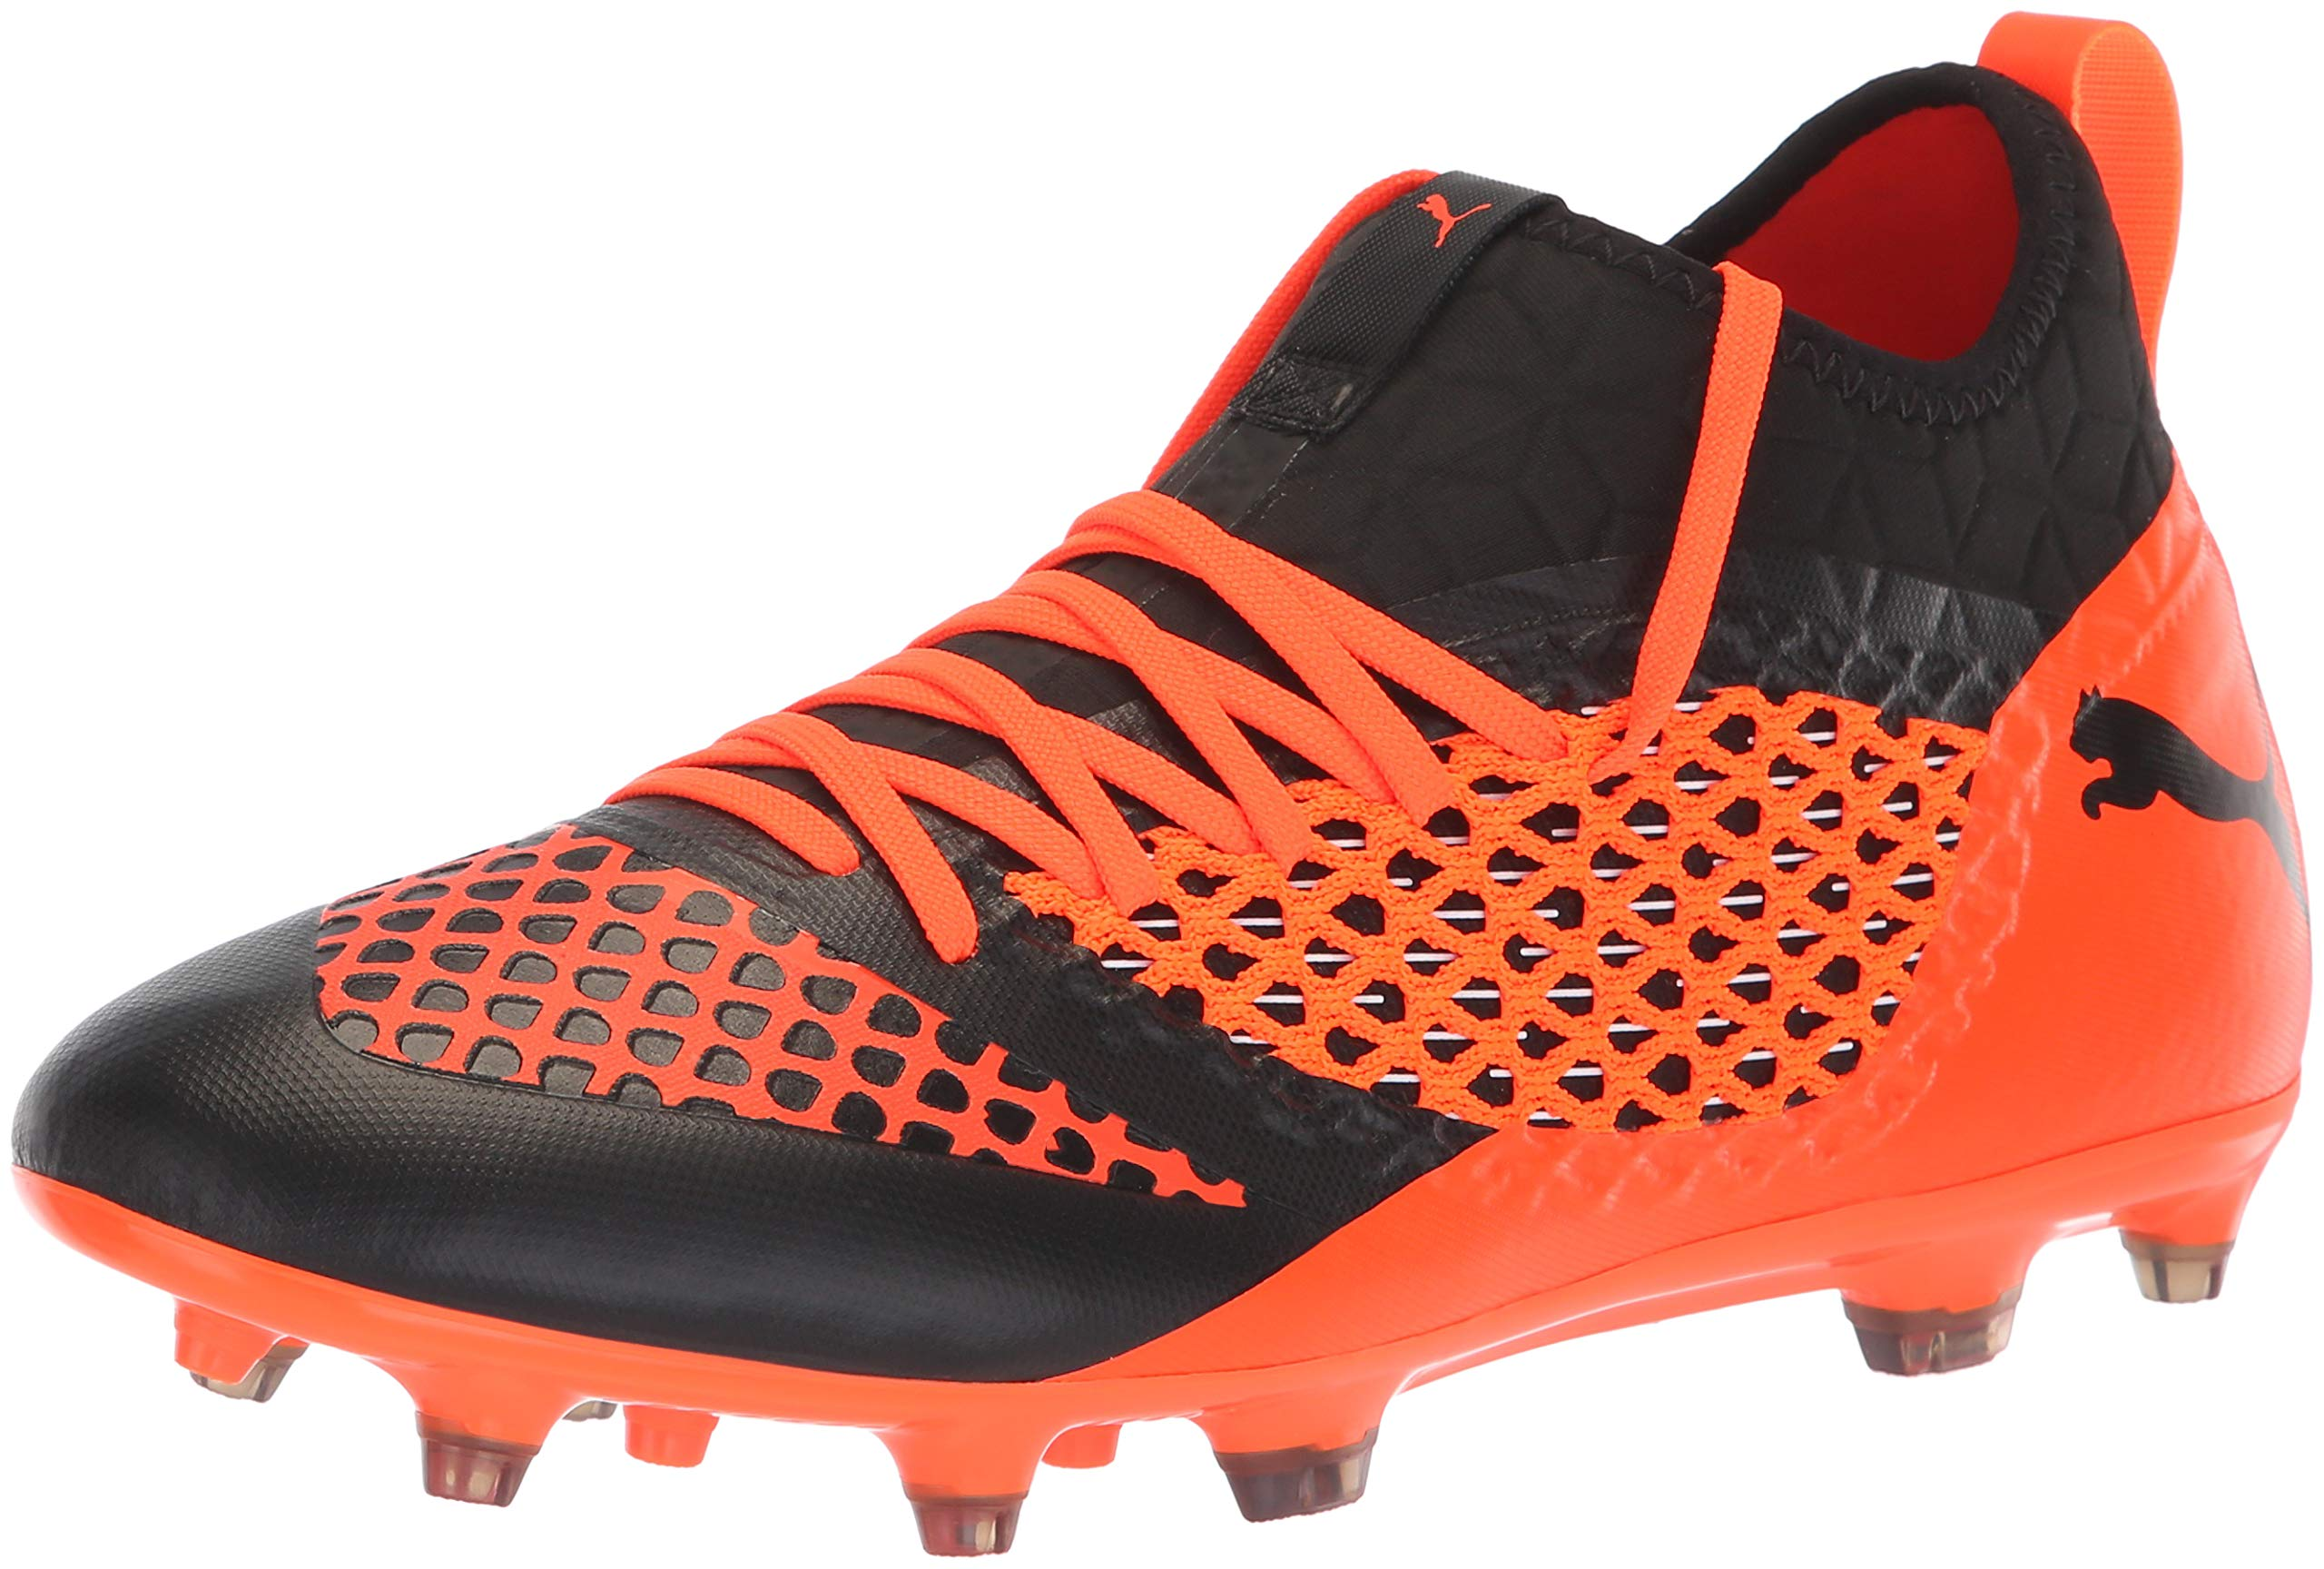 1ffe7f22 Details about PUMA Men's (12)-Future 2.3 Netfit FG/AG Soccer Shoe,  Black-Shocking Orange, 1..